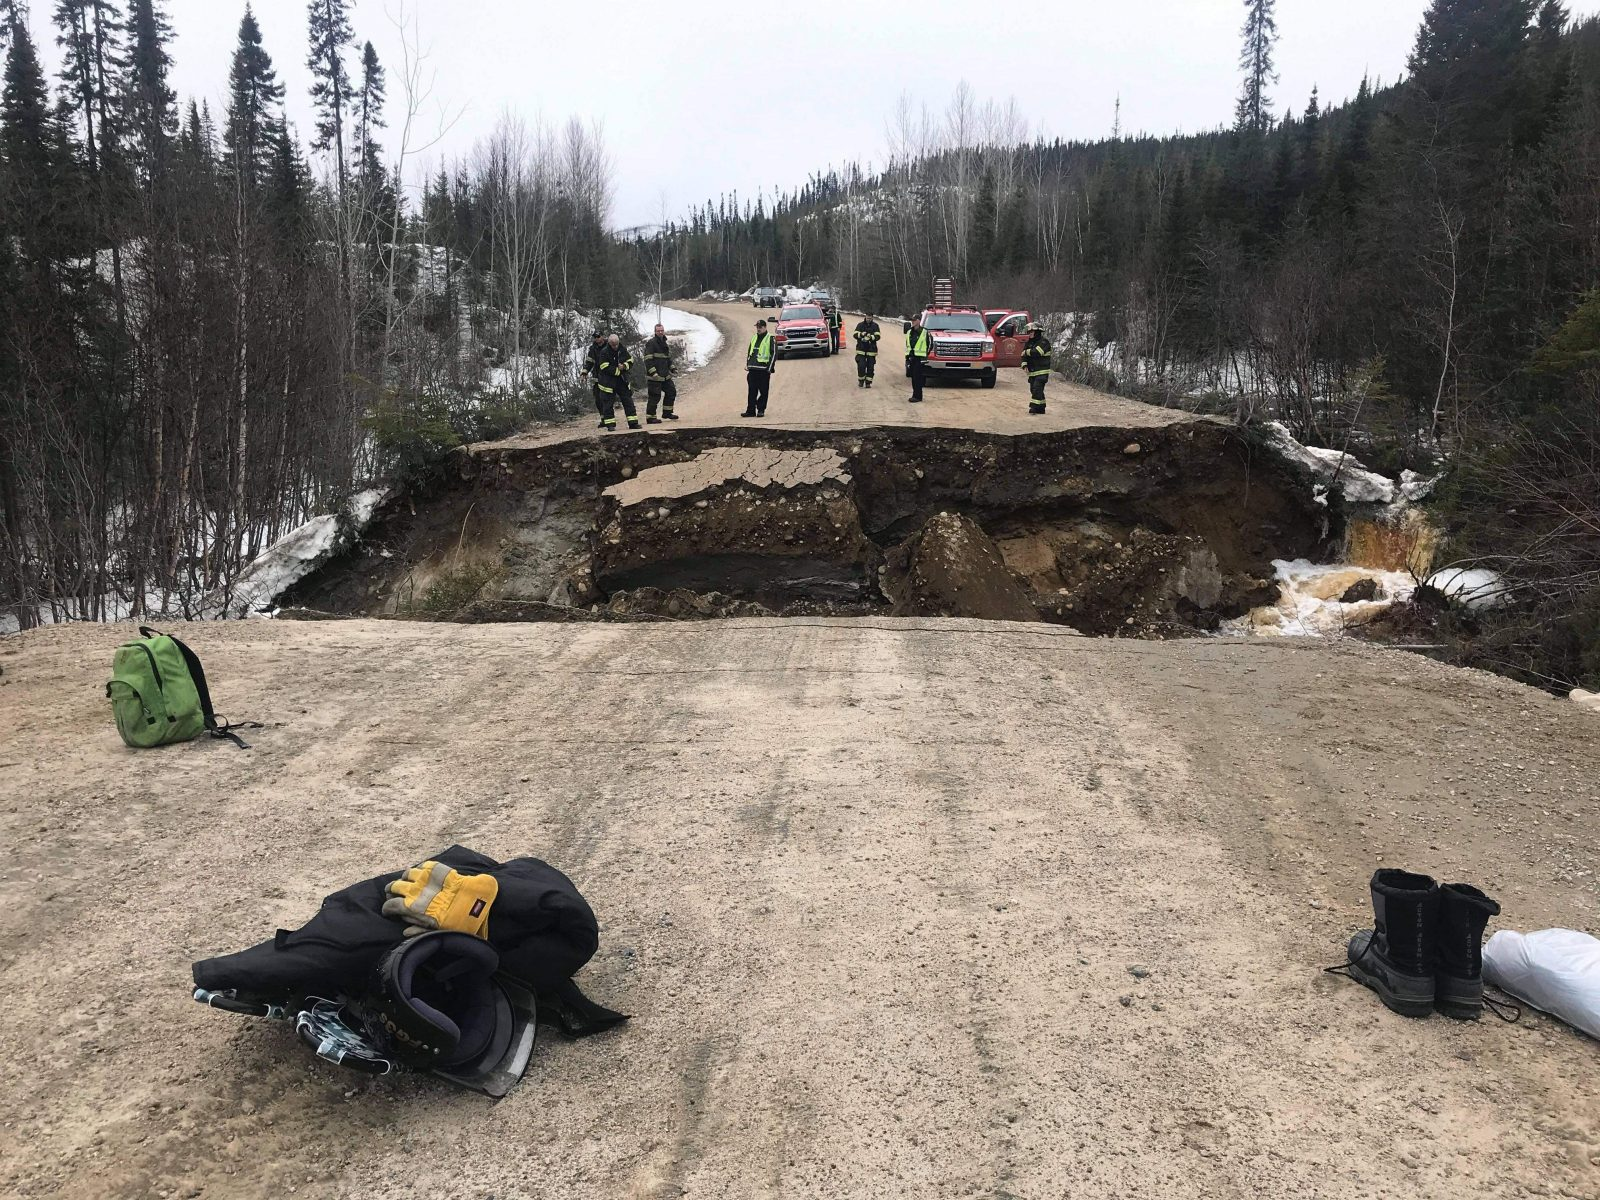 Chemin forestier Résolu : motoneigistes ramenés sains et saufs